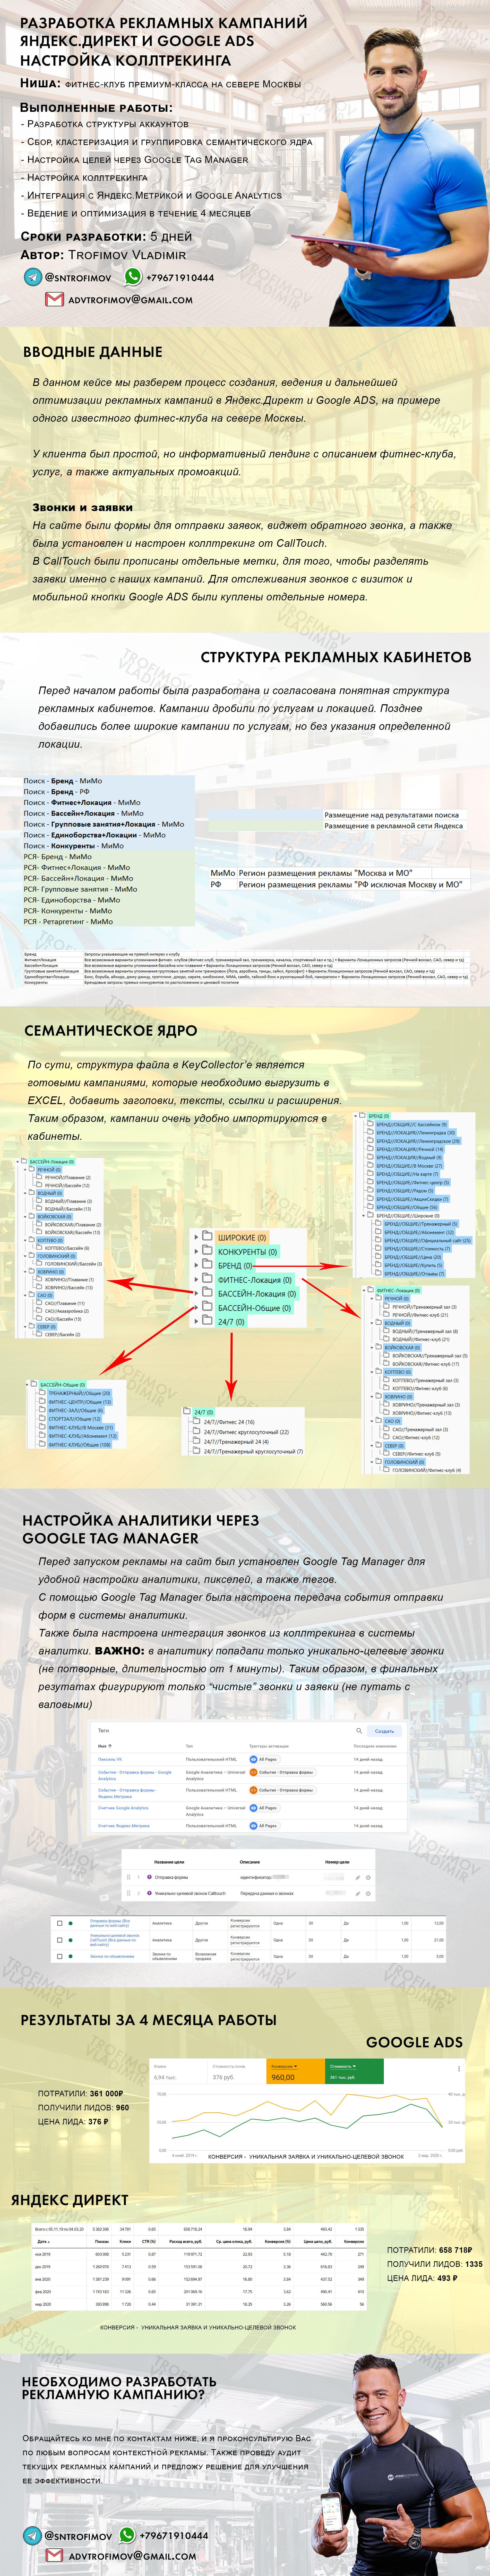 Яндекс Директ + Google ADS для фитнес-клуба